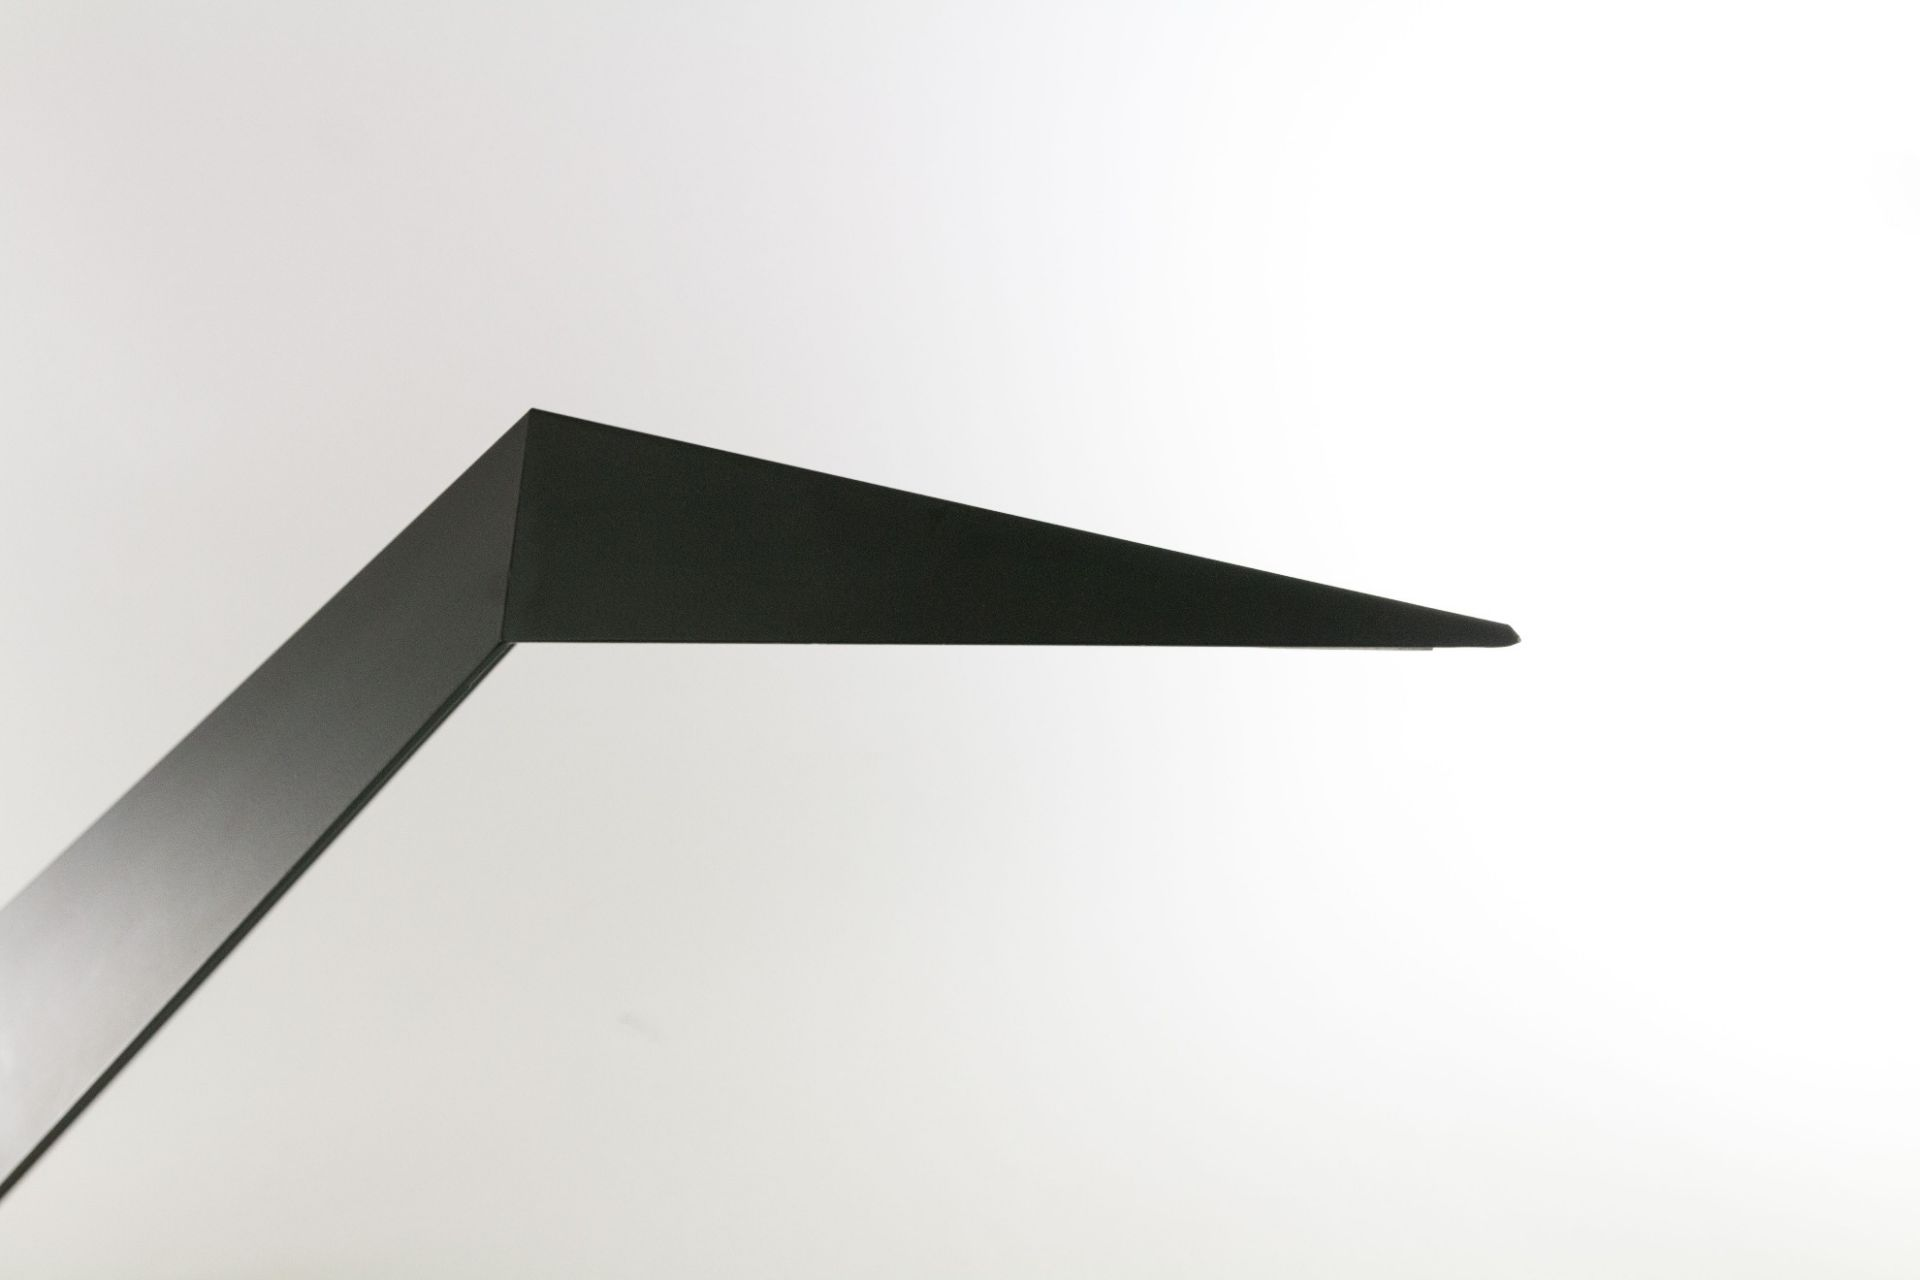 Concorde table lamp by Yves Christin for Antonangeli Illuminazione, 1970s